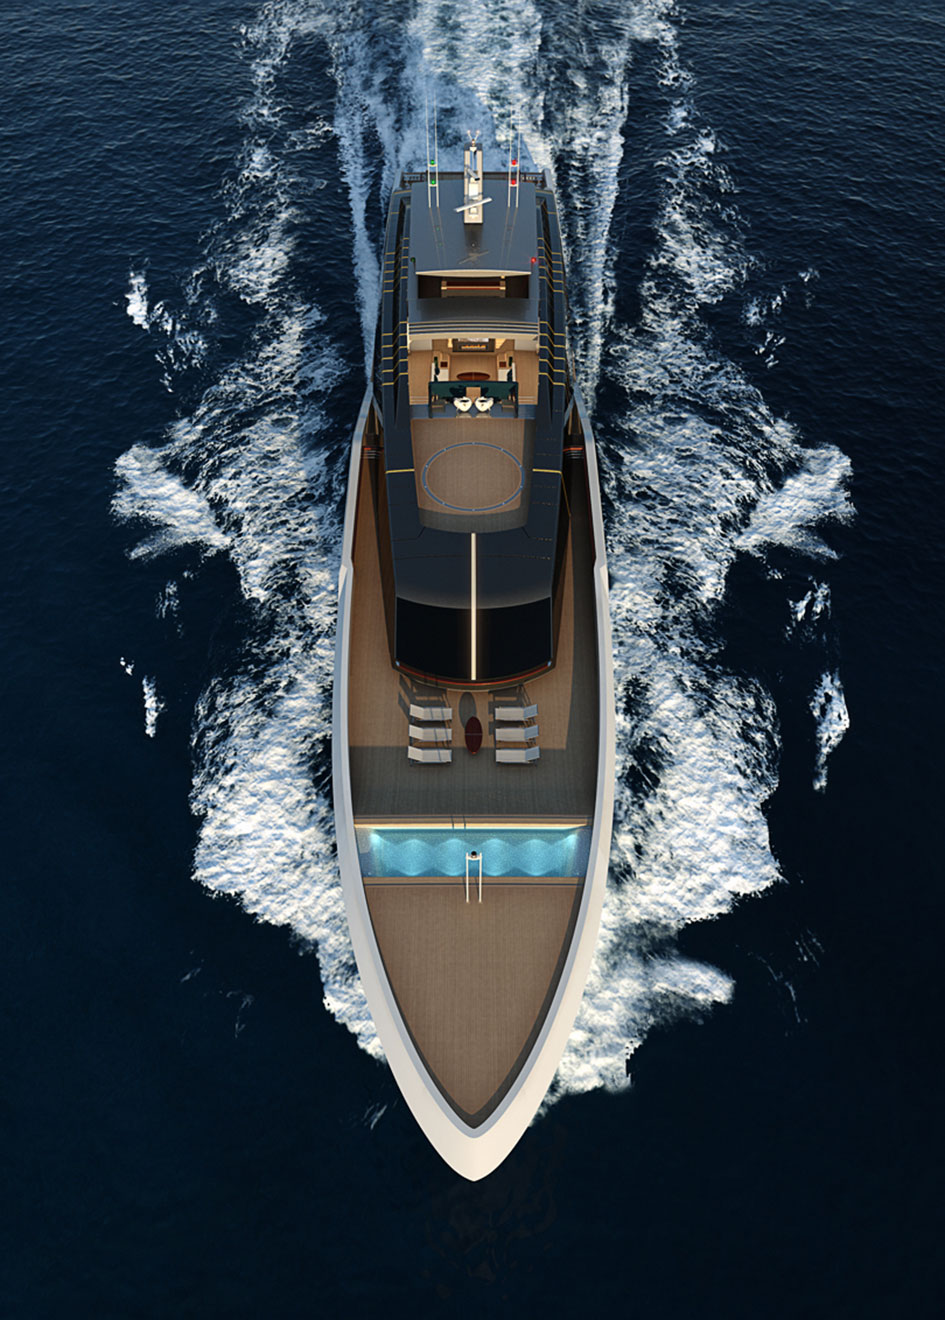 Luca Vallebona Pentagramma Yacht Concept Aerial Vertical